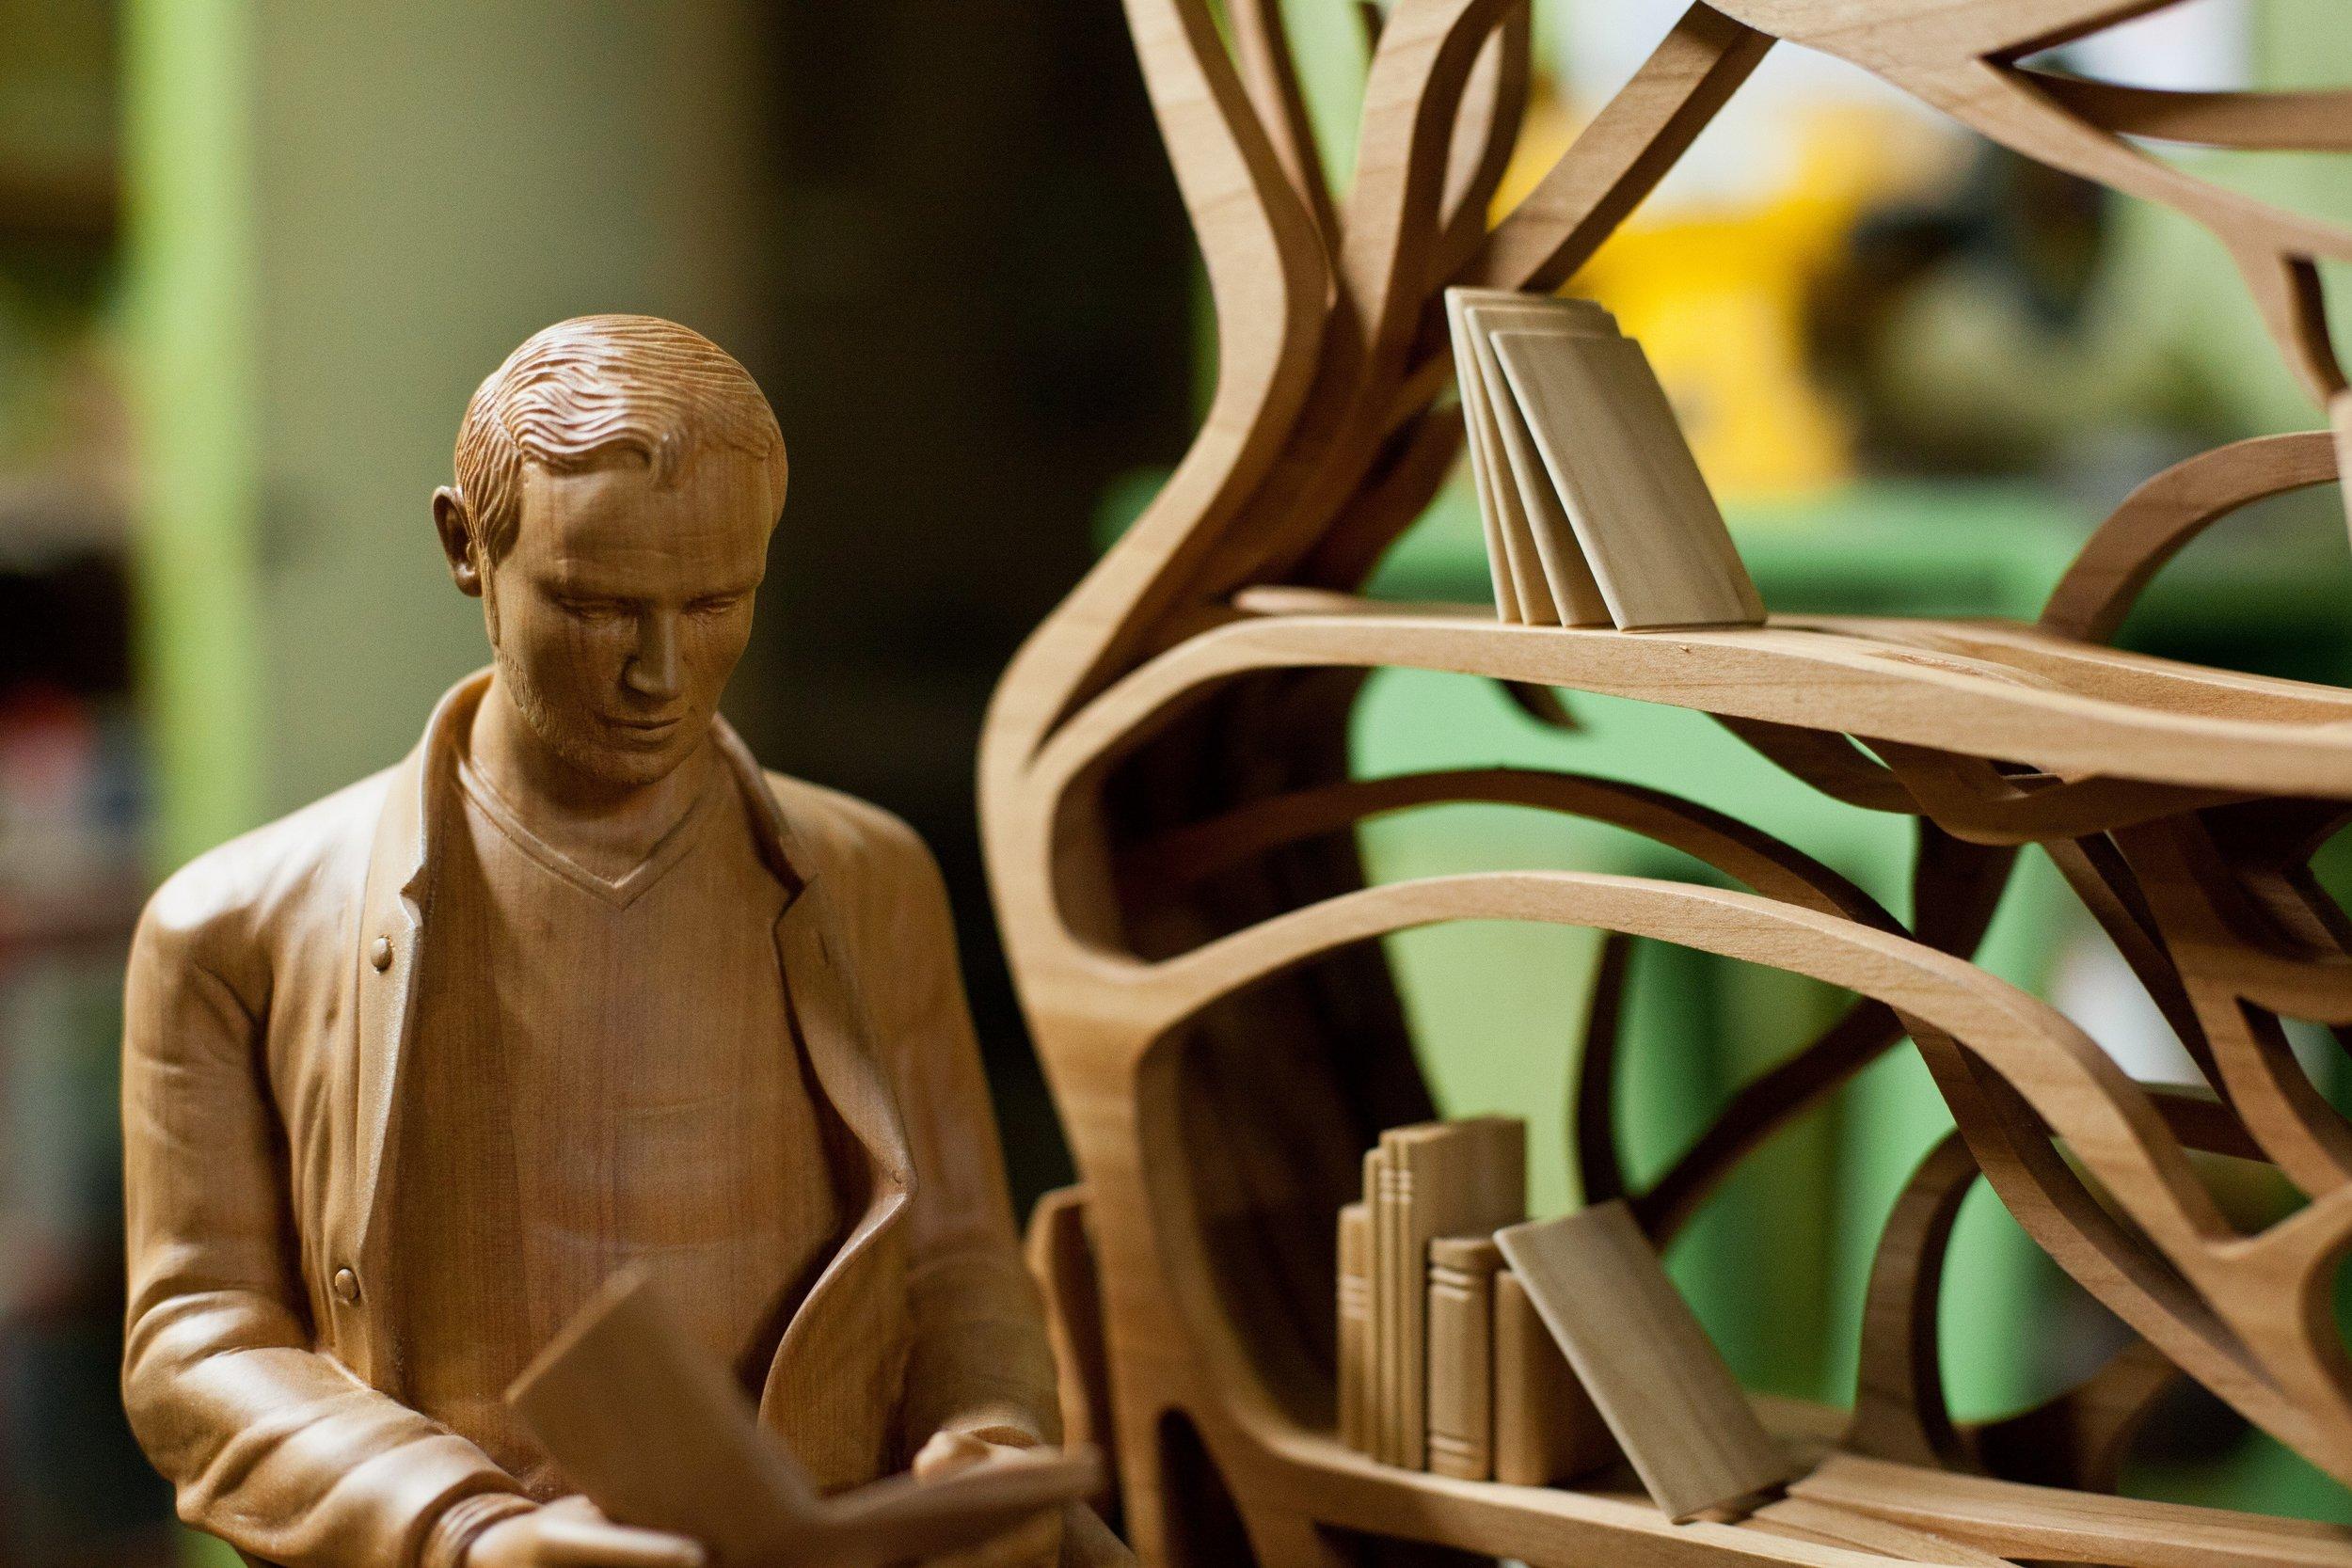 Sebastian ErraZuriz,  Metamorphosis maquette , 2009 (detail).Rauli.18 x 30 x 10 in.Courtesy of Sebastian Errazuriz Studio.2016.SE.01.Photo: Sebastian Errazuriz Studio  METHOD: Hand carved, dremels,rotary tools